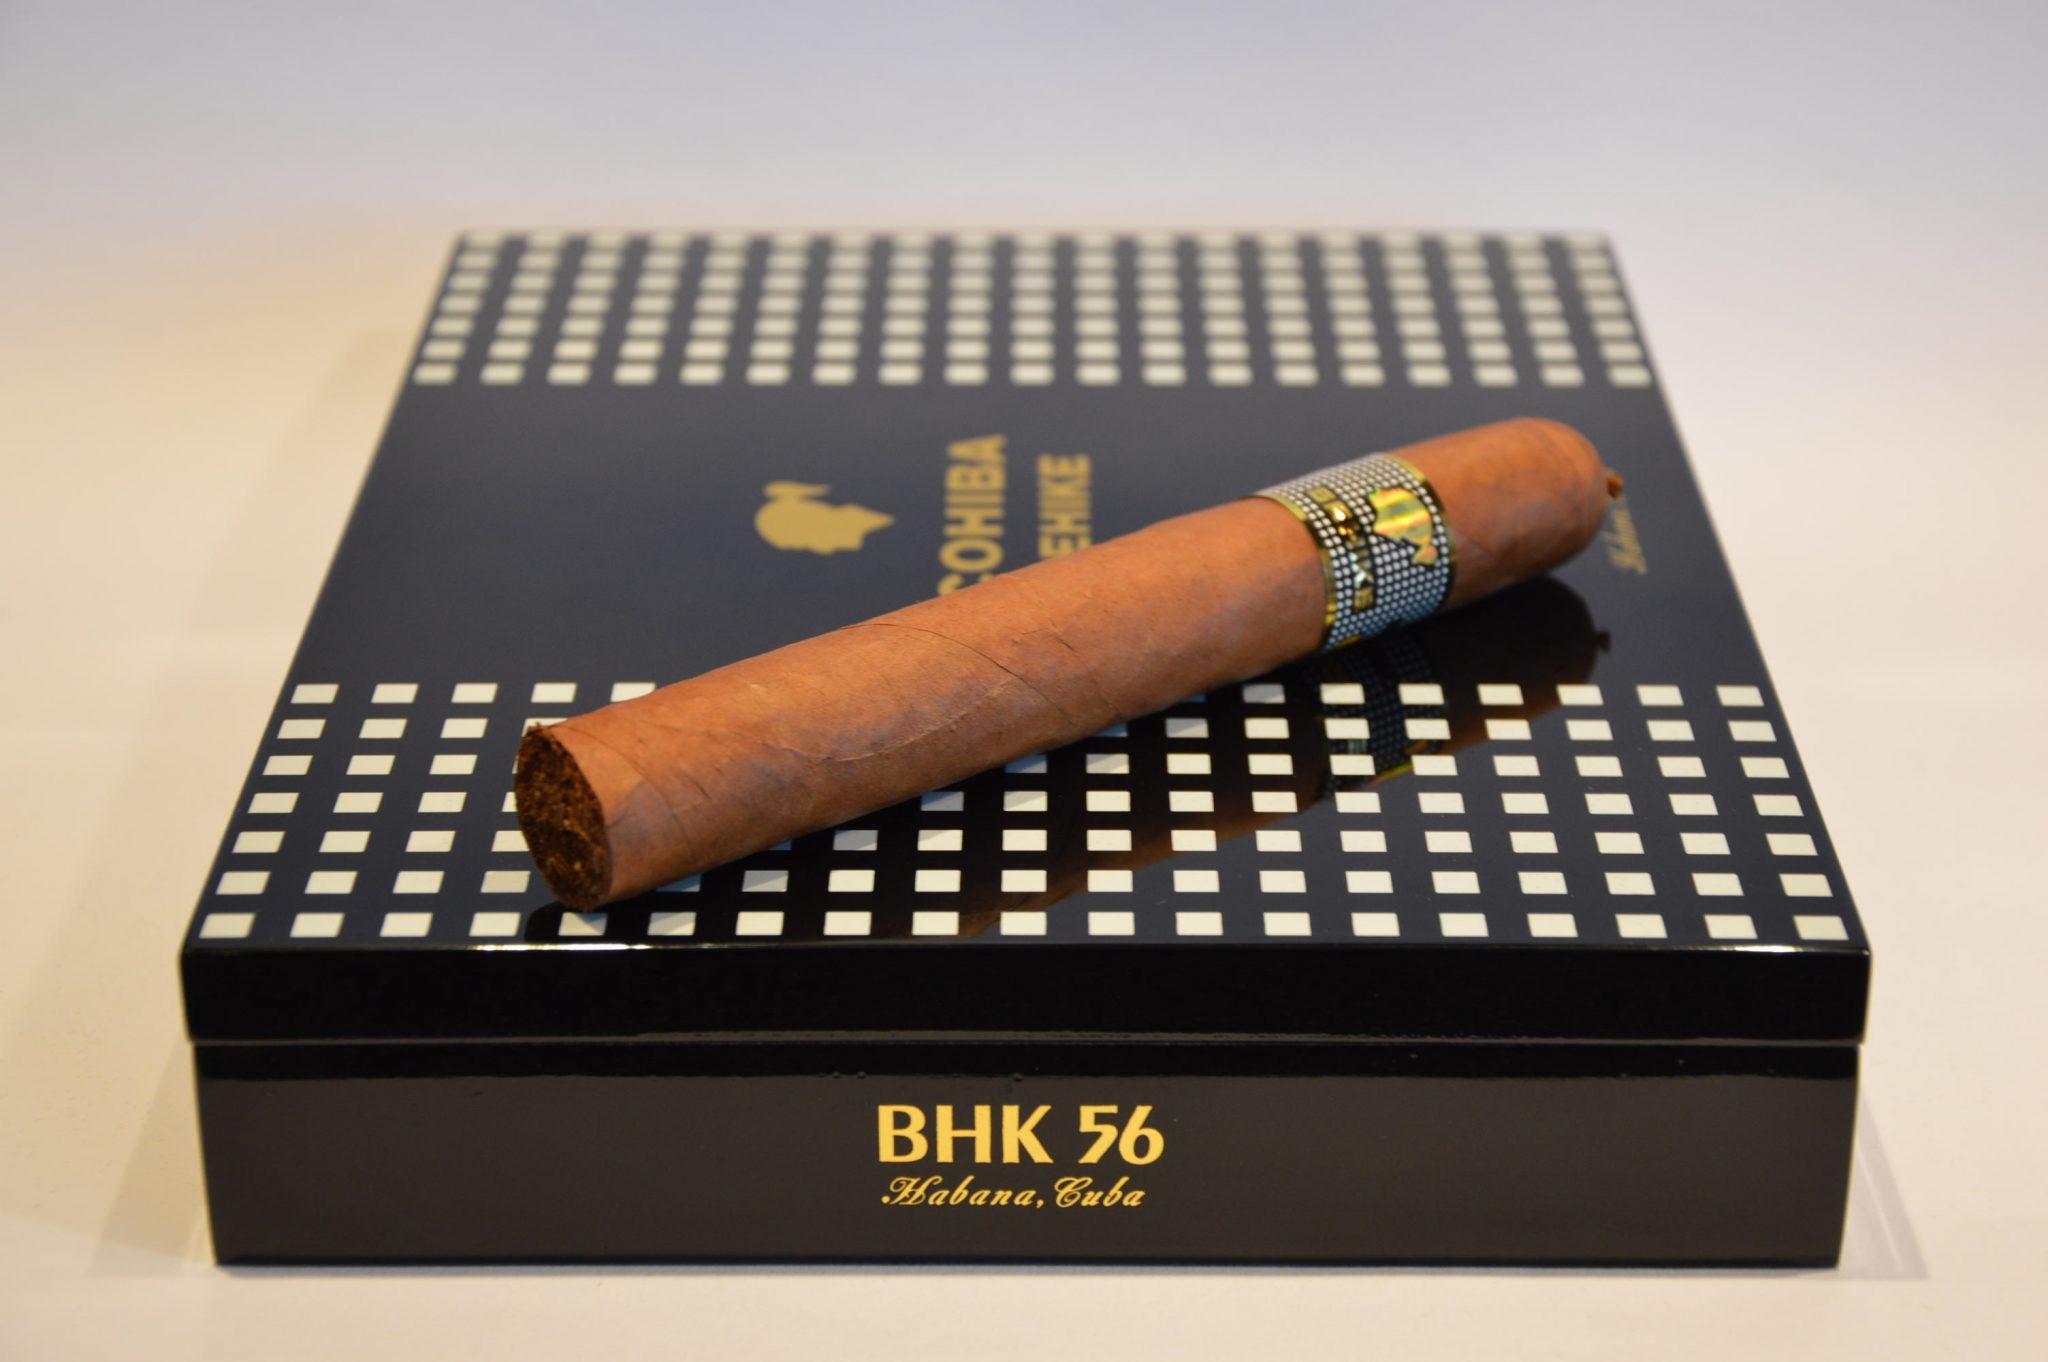 Xì gà Cohiba Behike 56